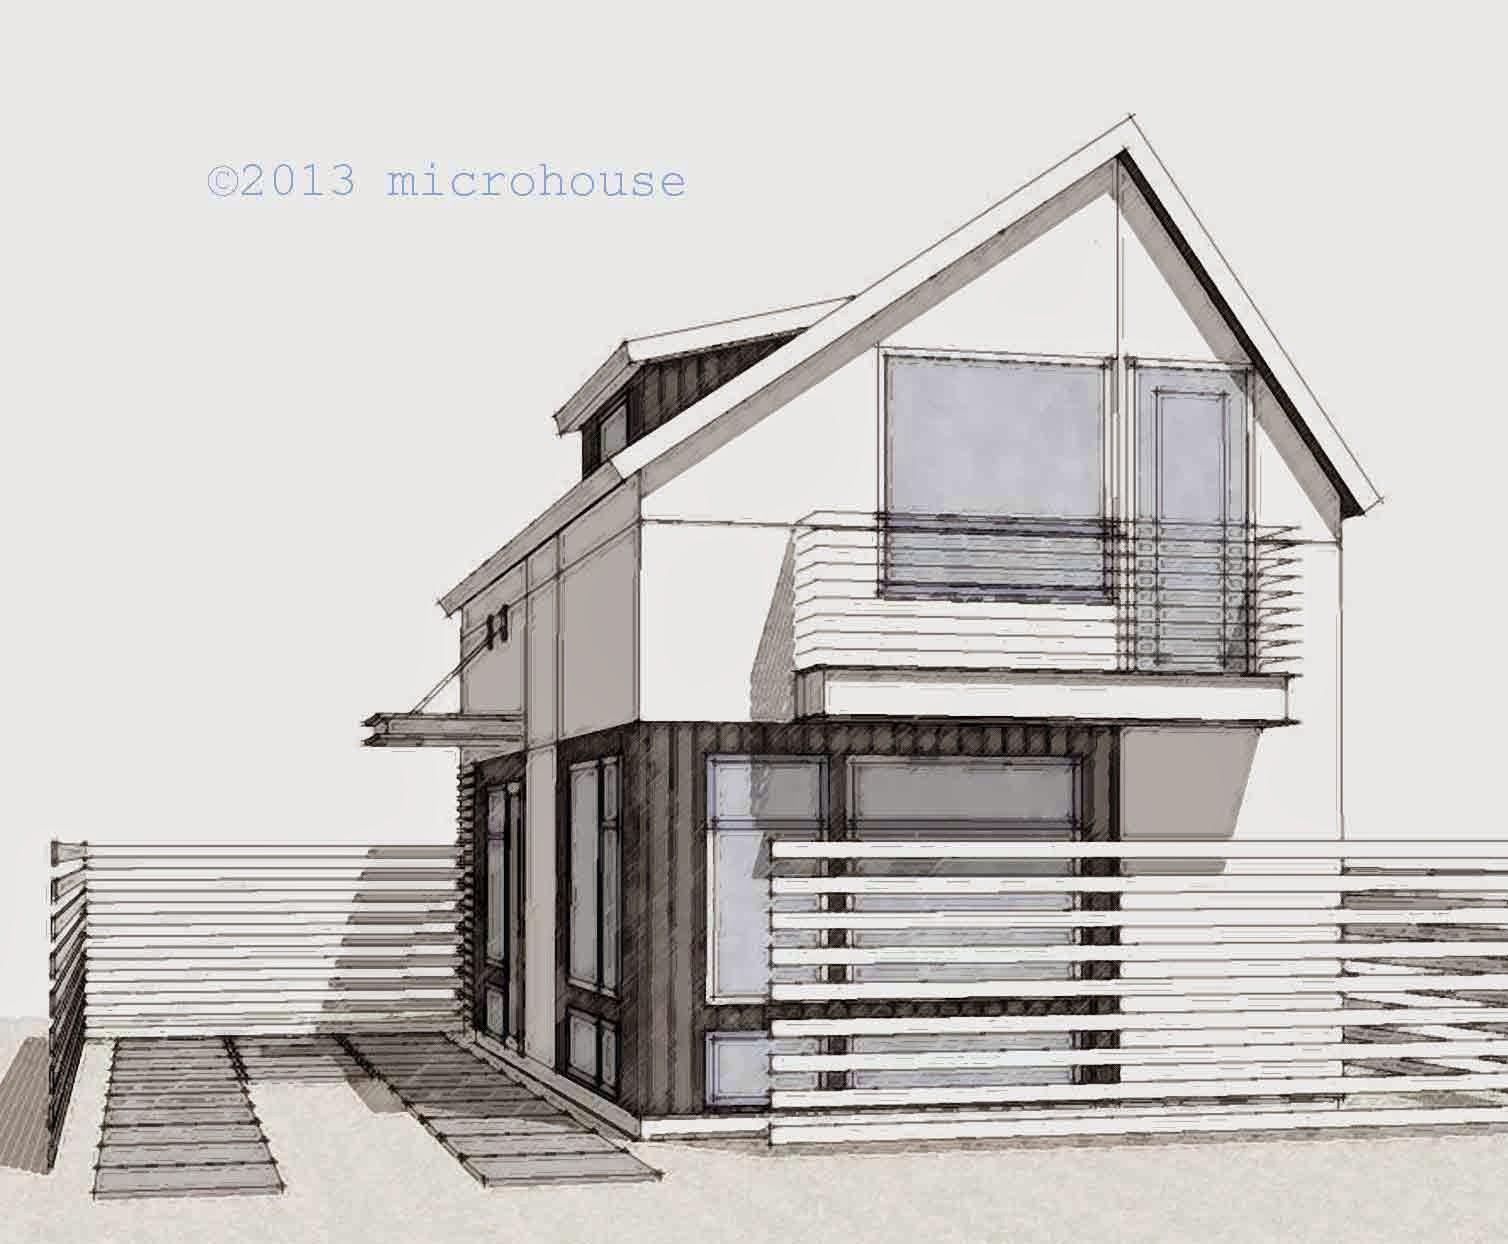 backyard cottage, microhouse, dadu, backyard cottages